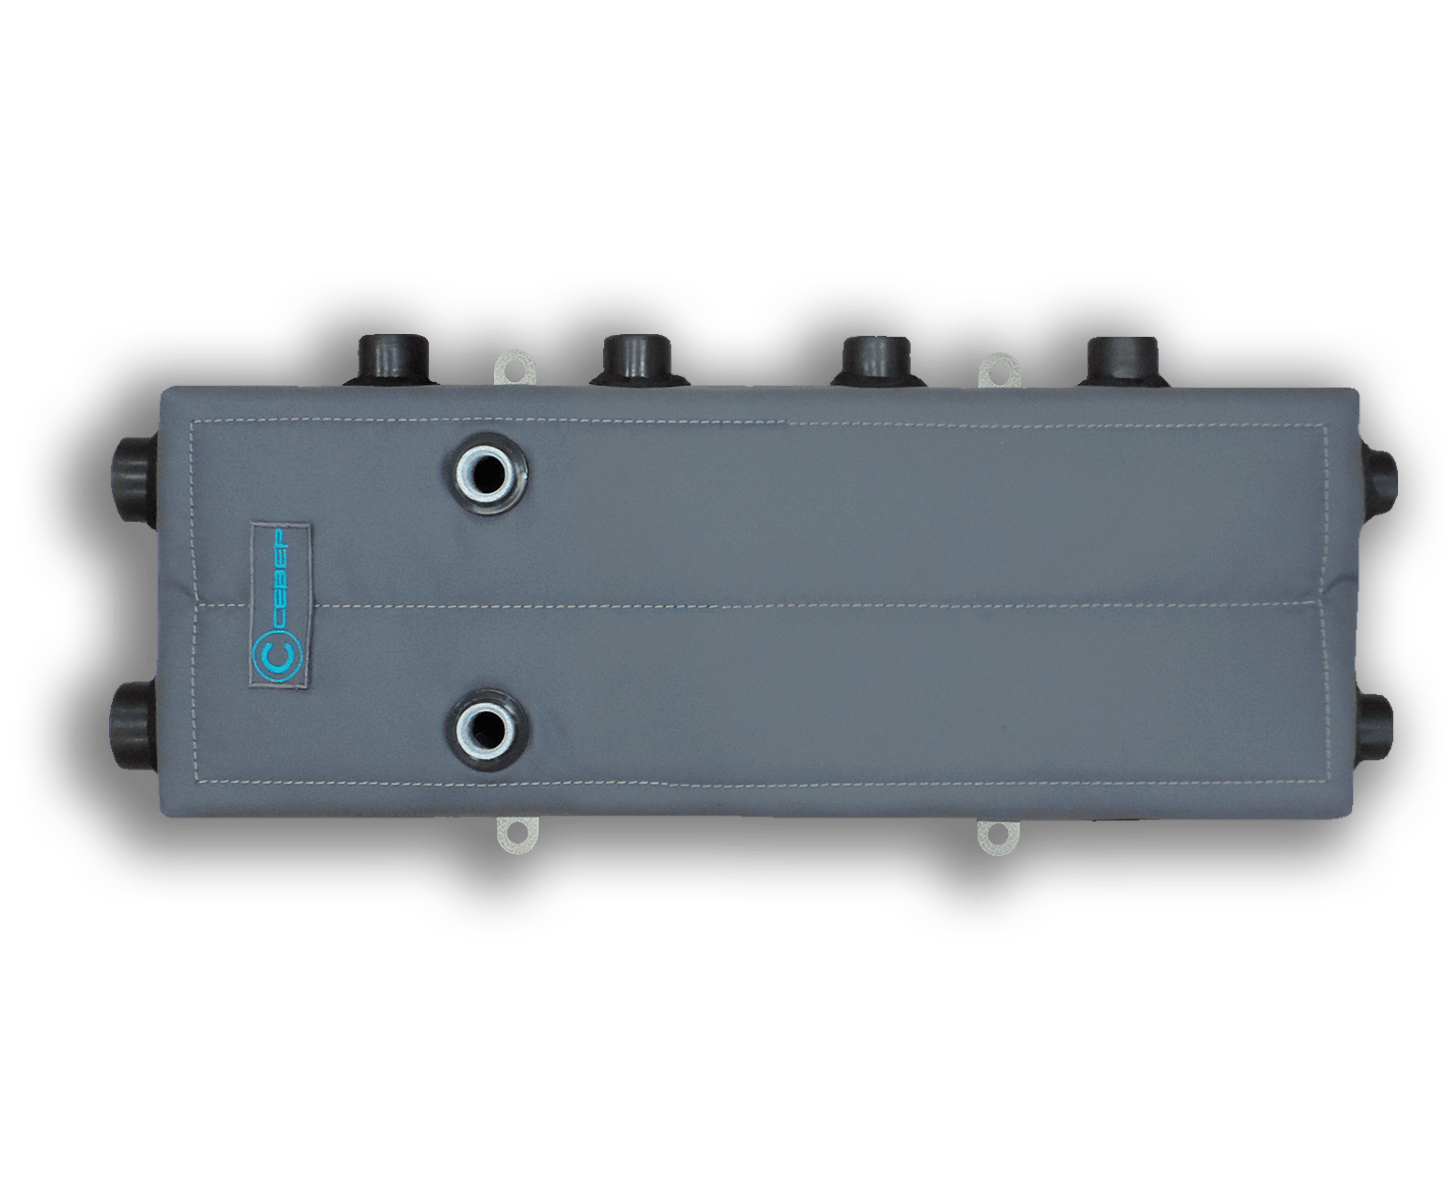 Теплоизоляция, теплоизоляционный чехол для гидрообвязки Север КМ2+1